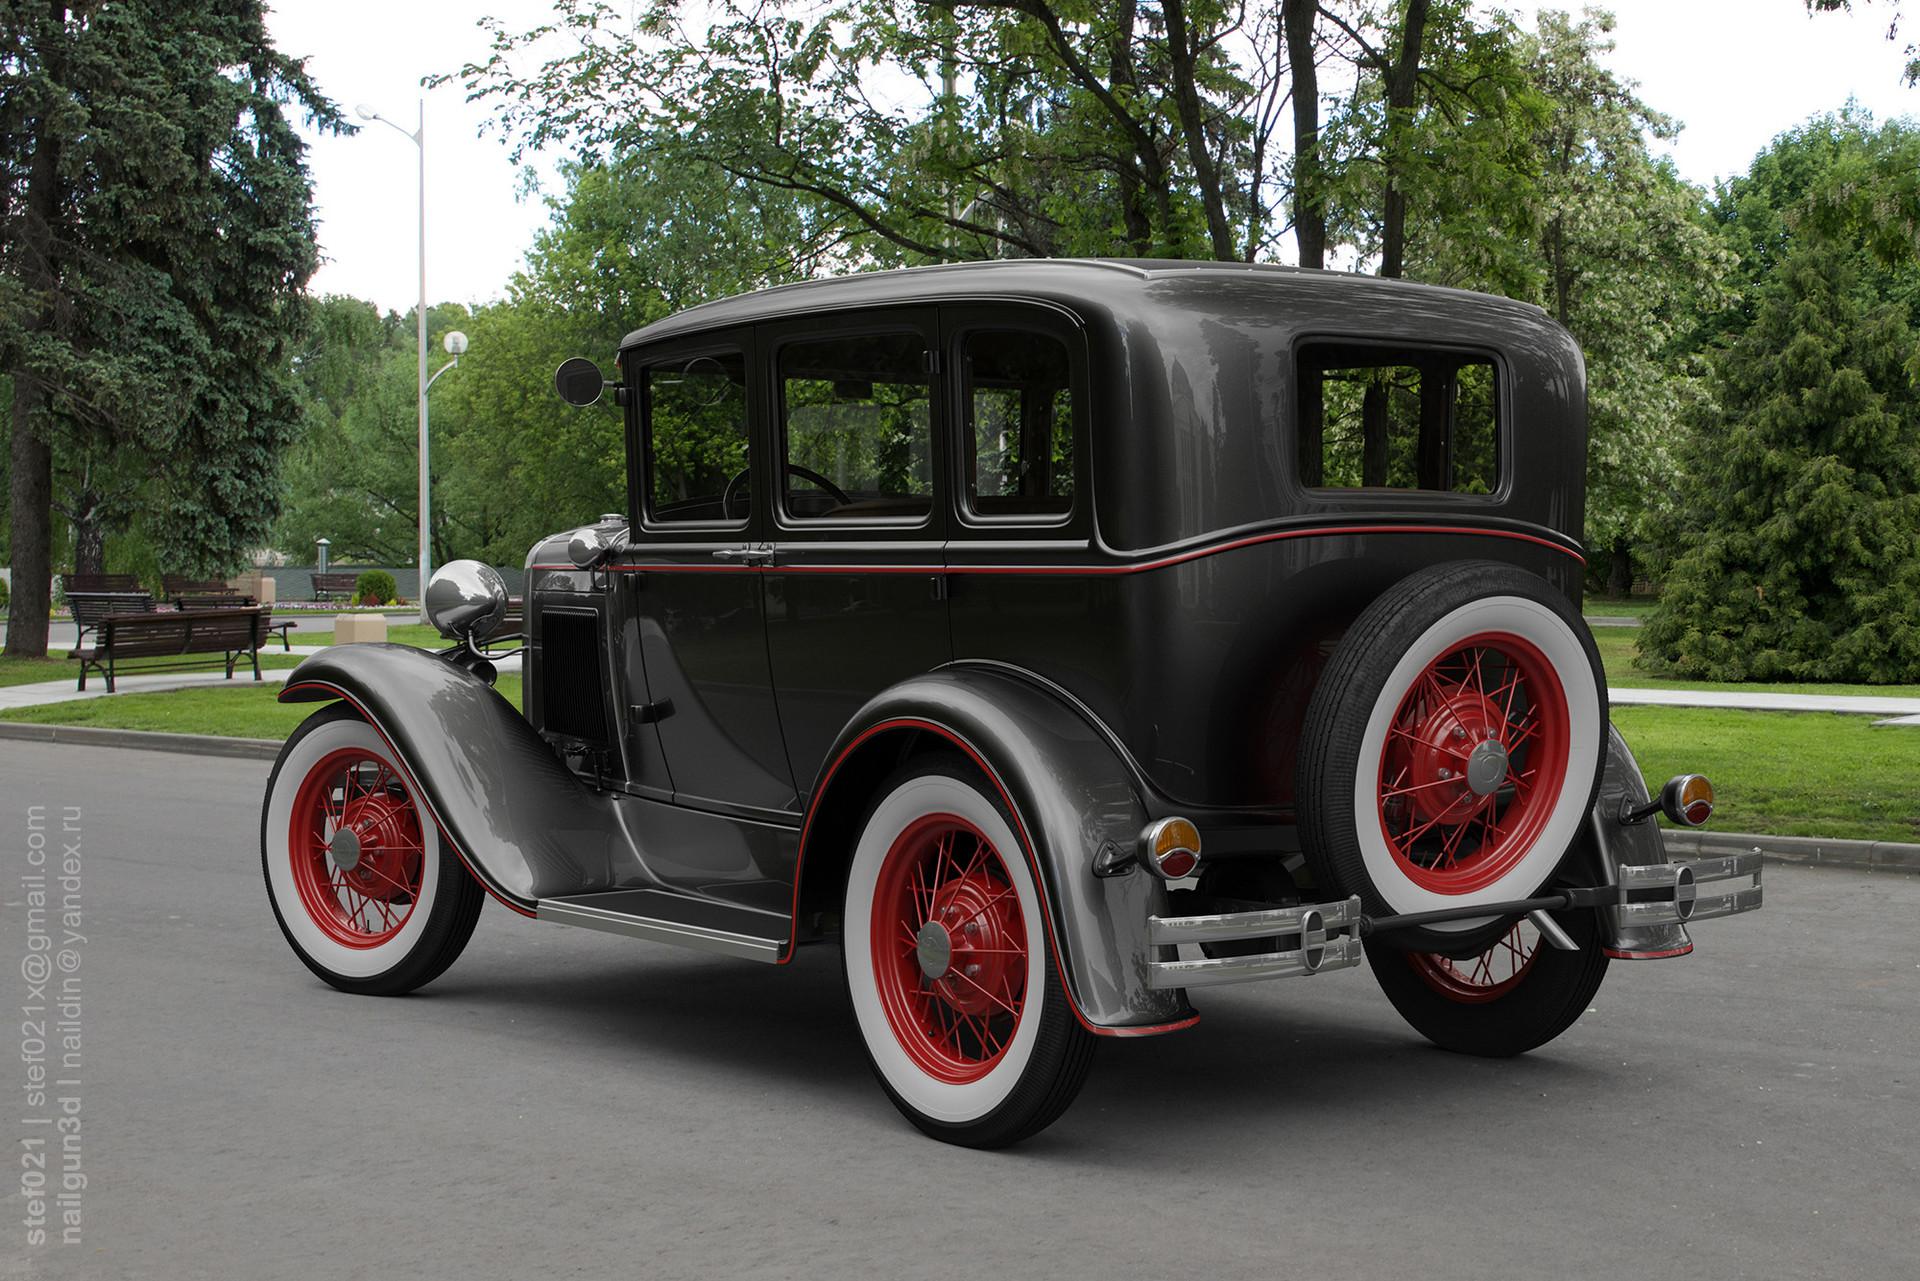 Nail khusnutdinov a0003 ford a fordor 1931 render 2